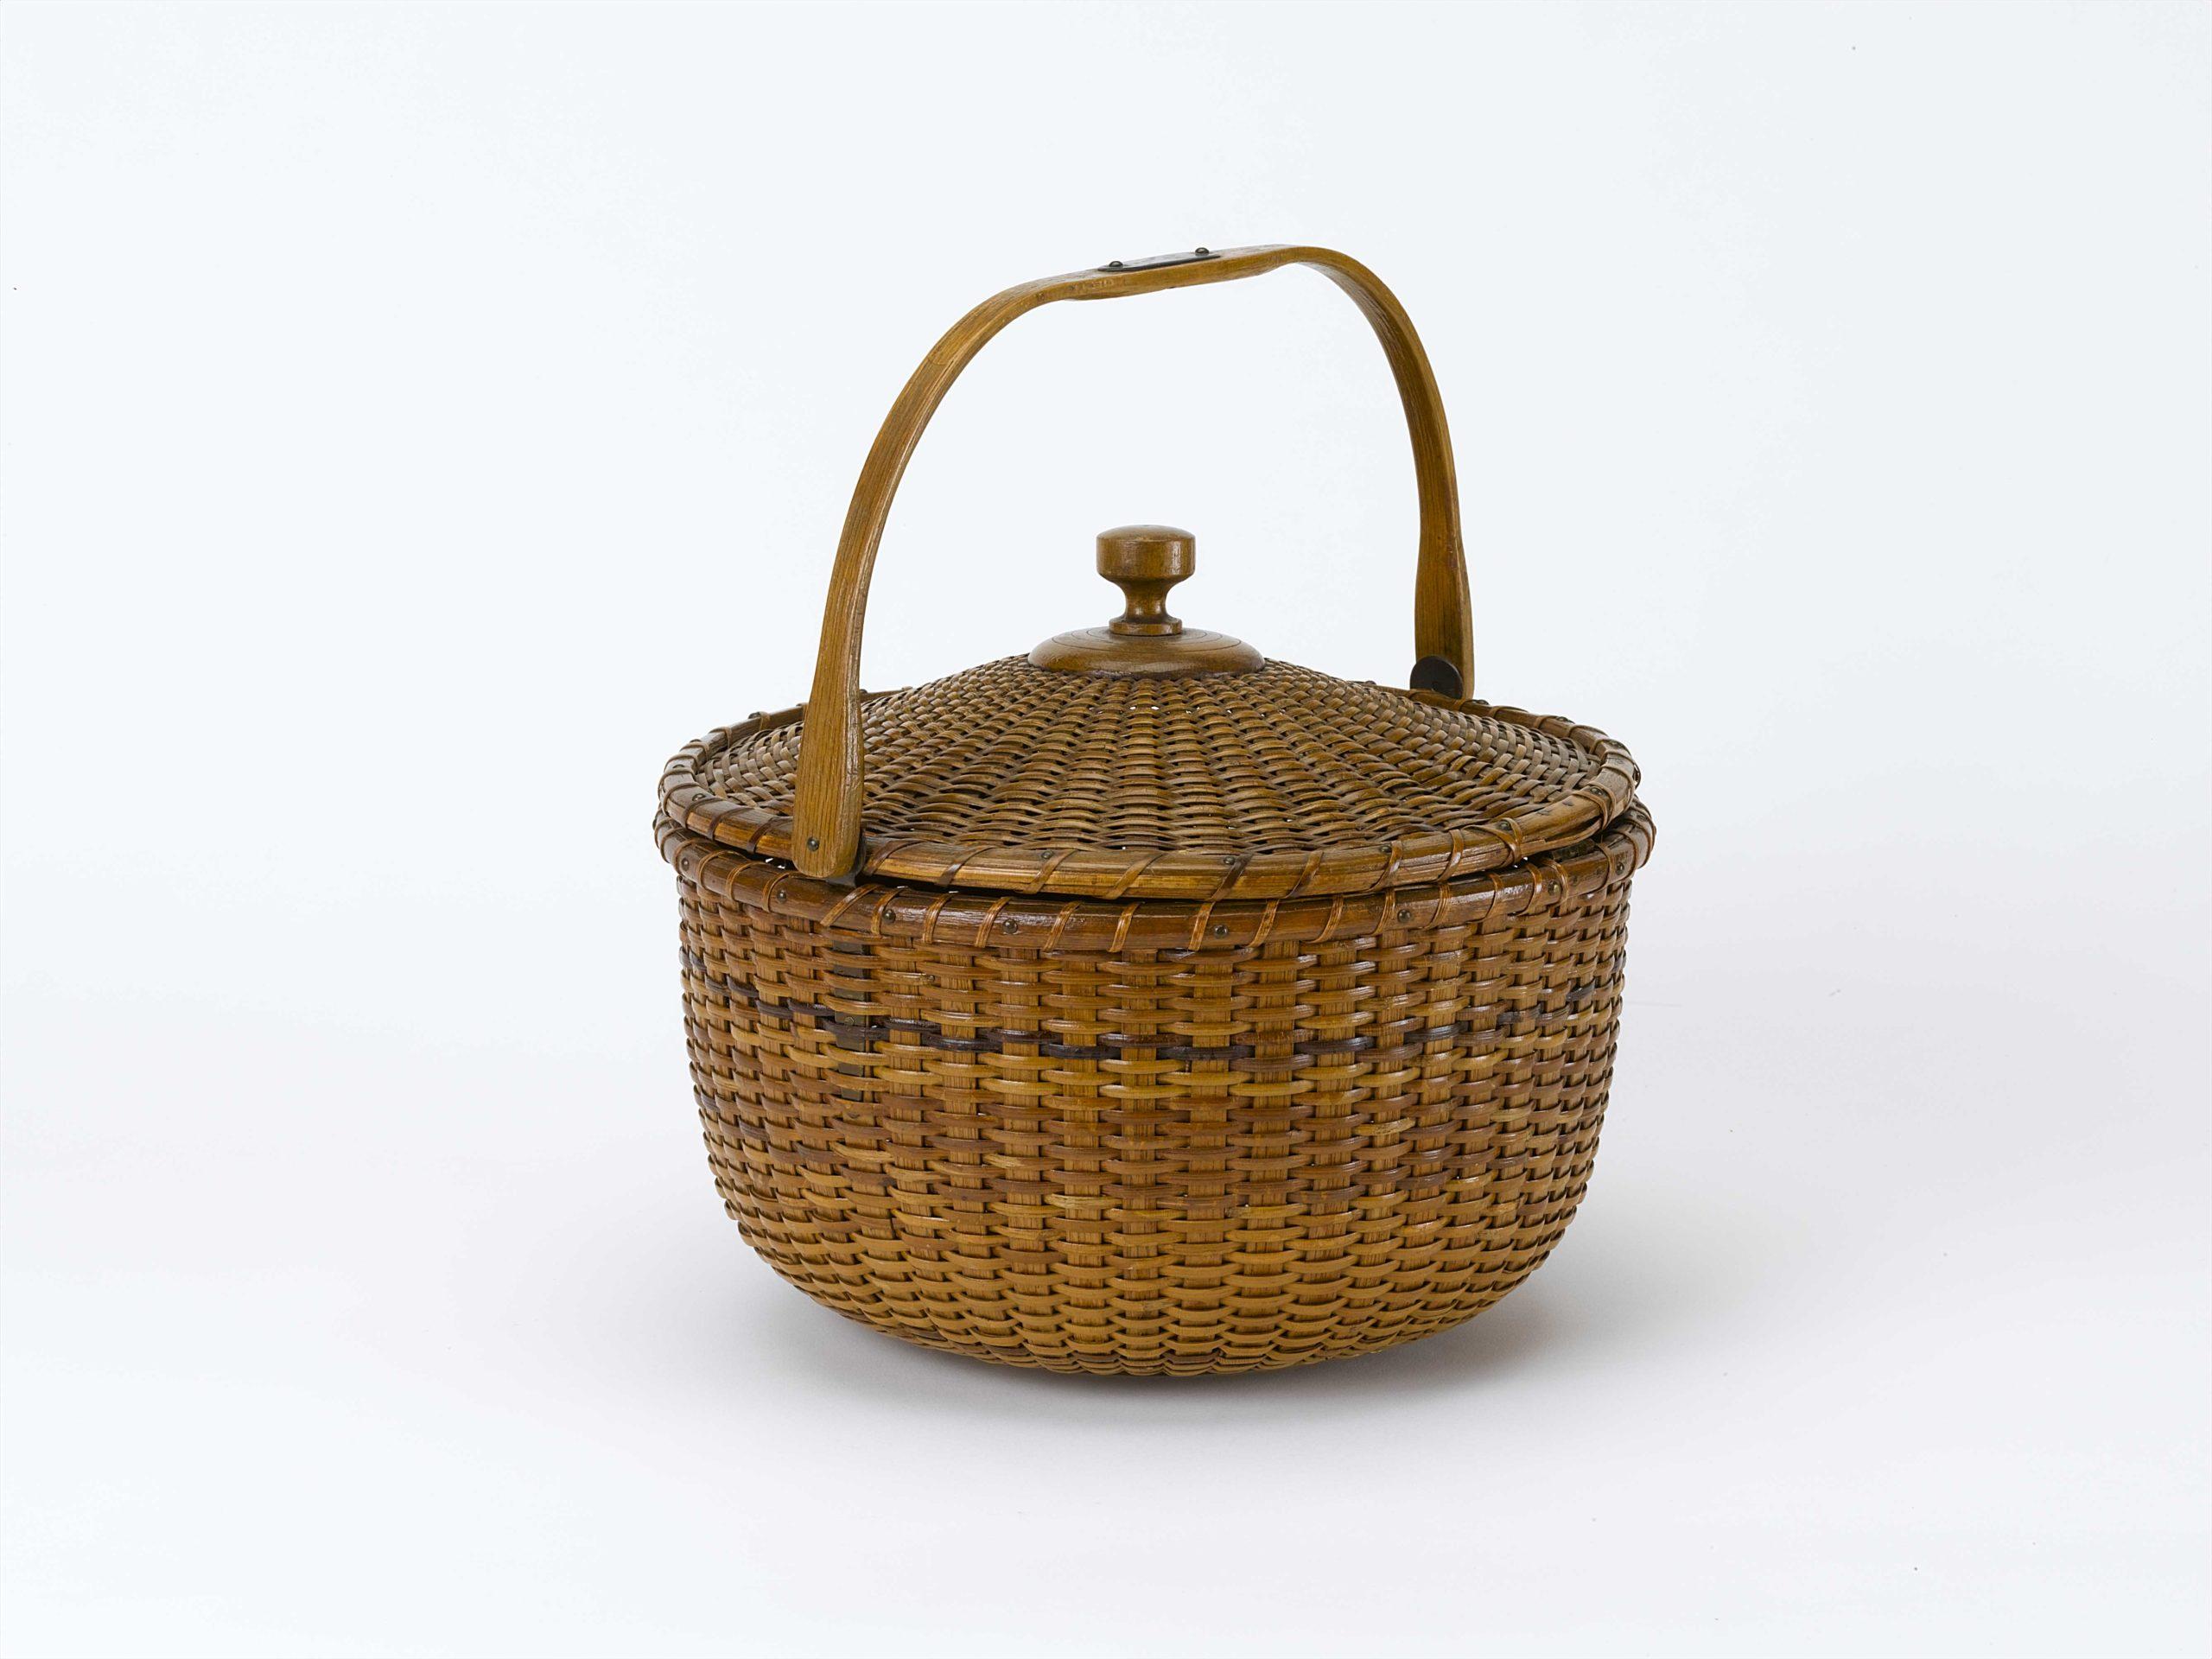 """David A. Schorsch and Eileen M. Smiles of American Antiques talk about Nantucket Lightship basket"""